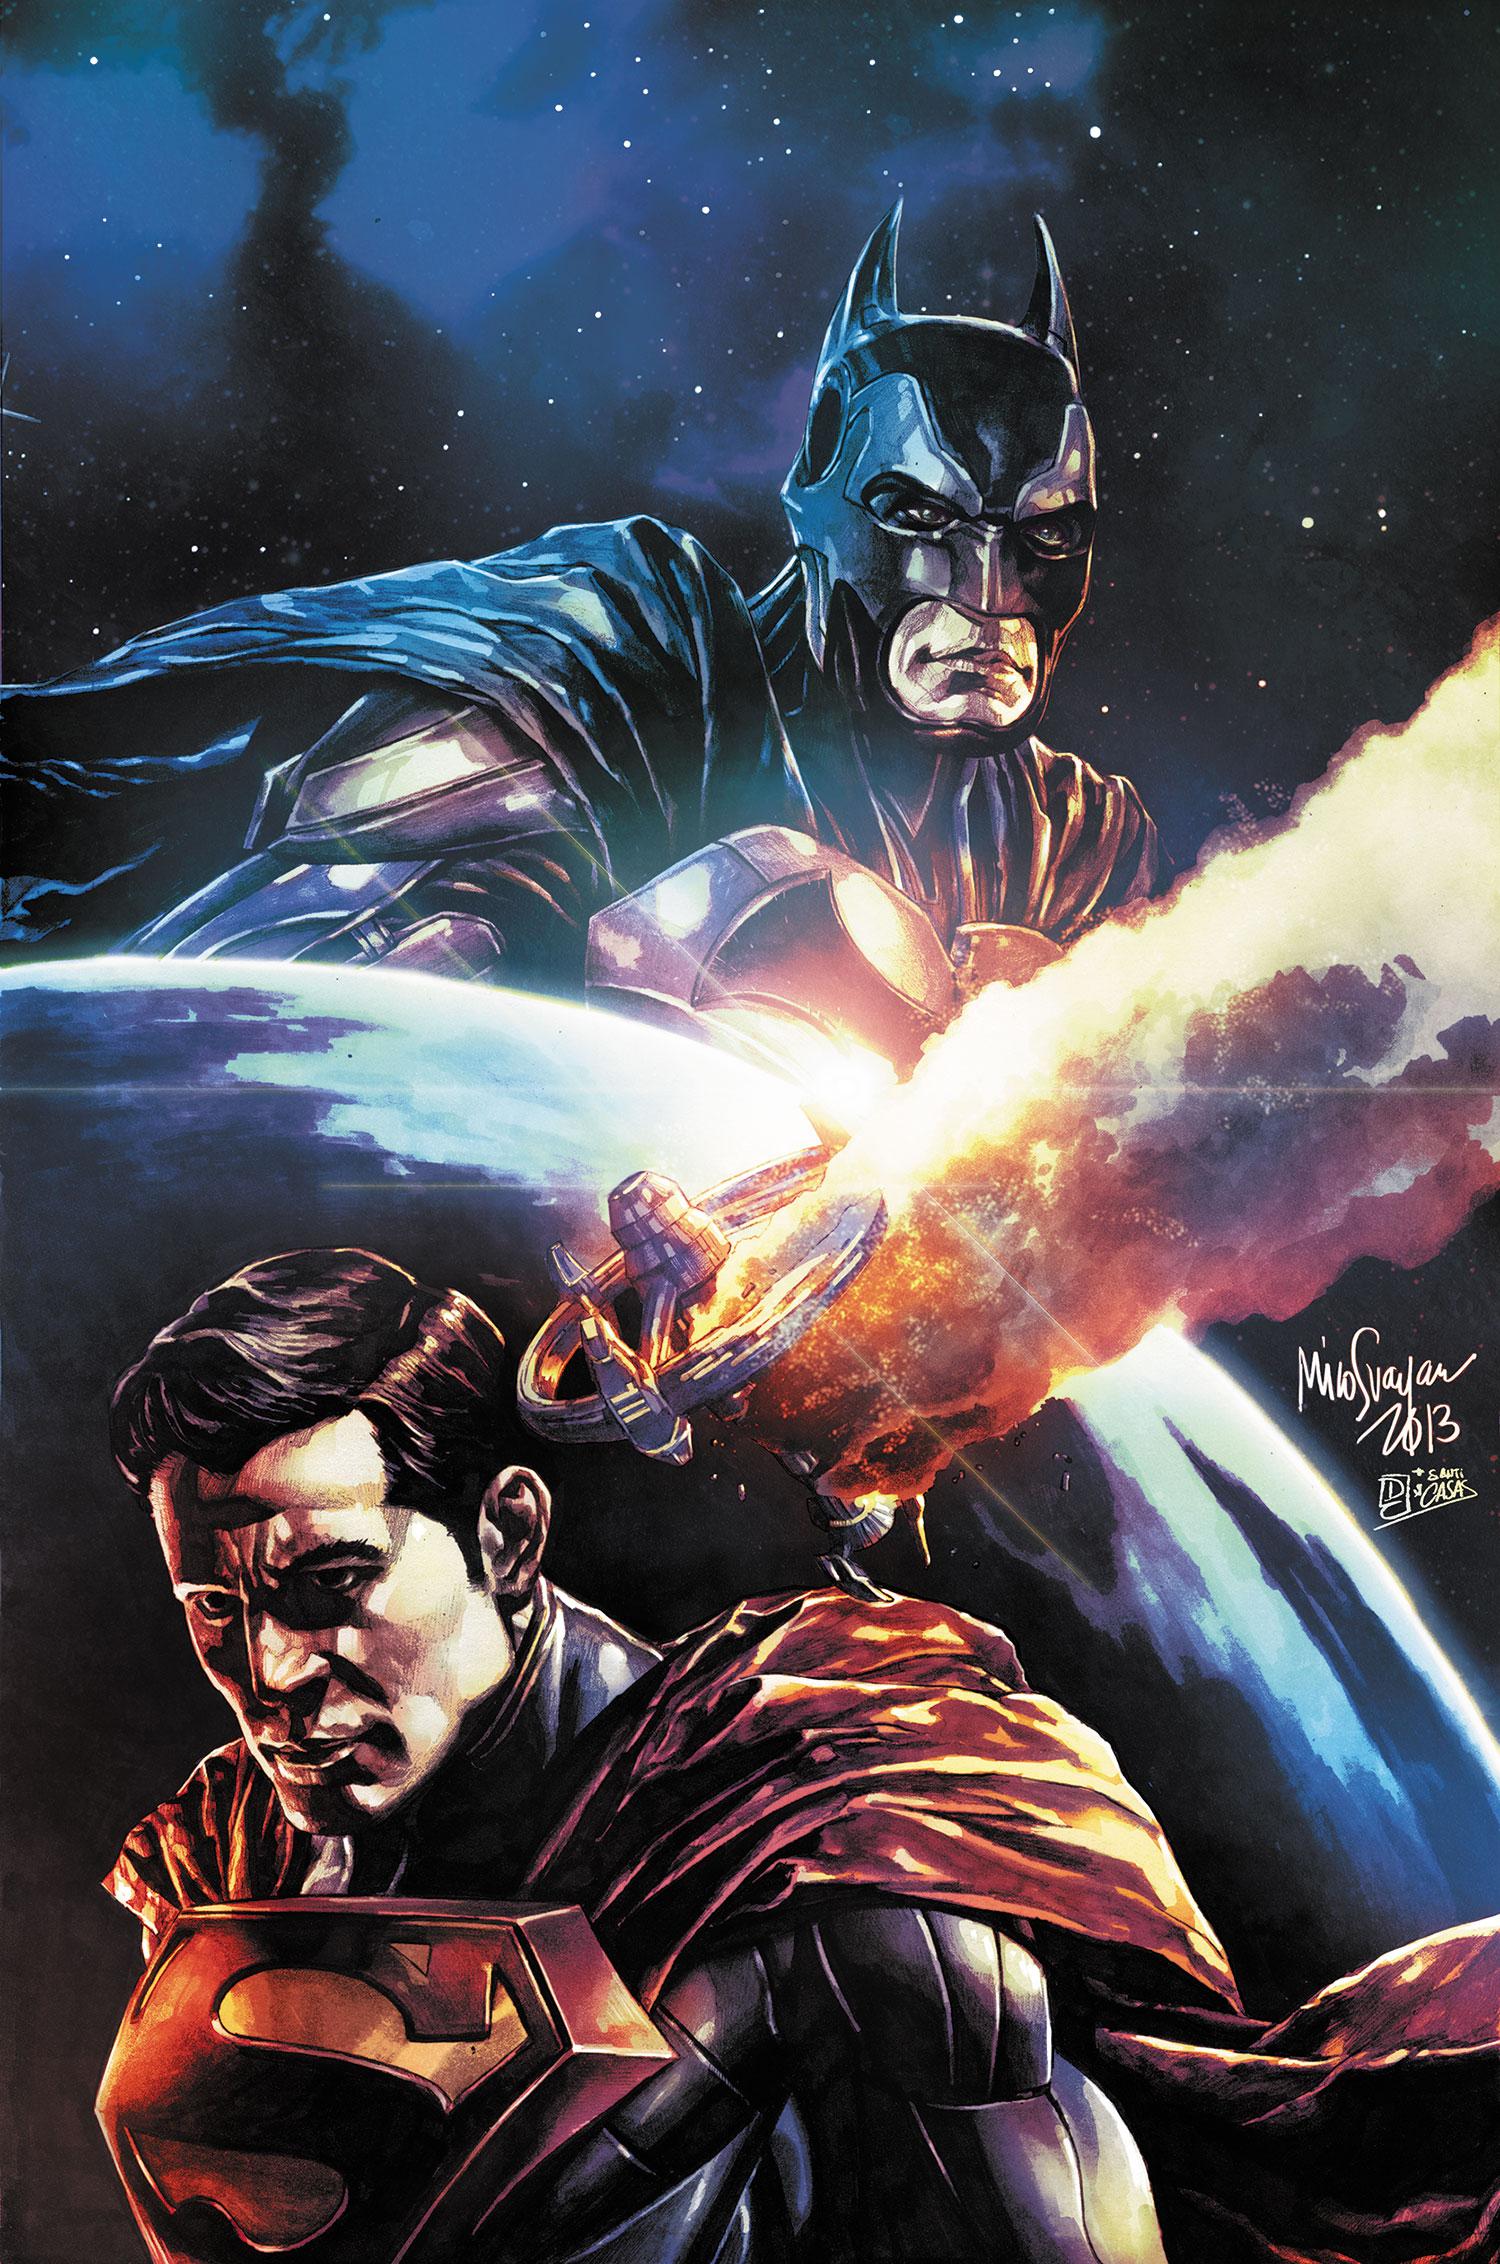 Image result for Injustice comic